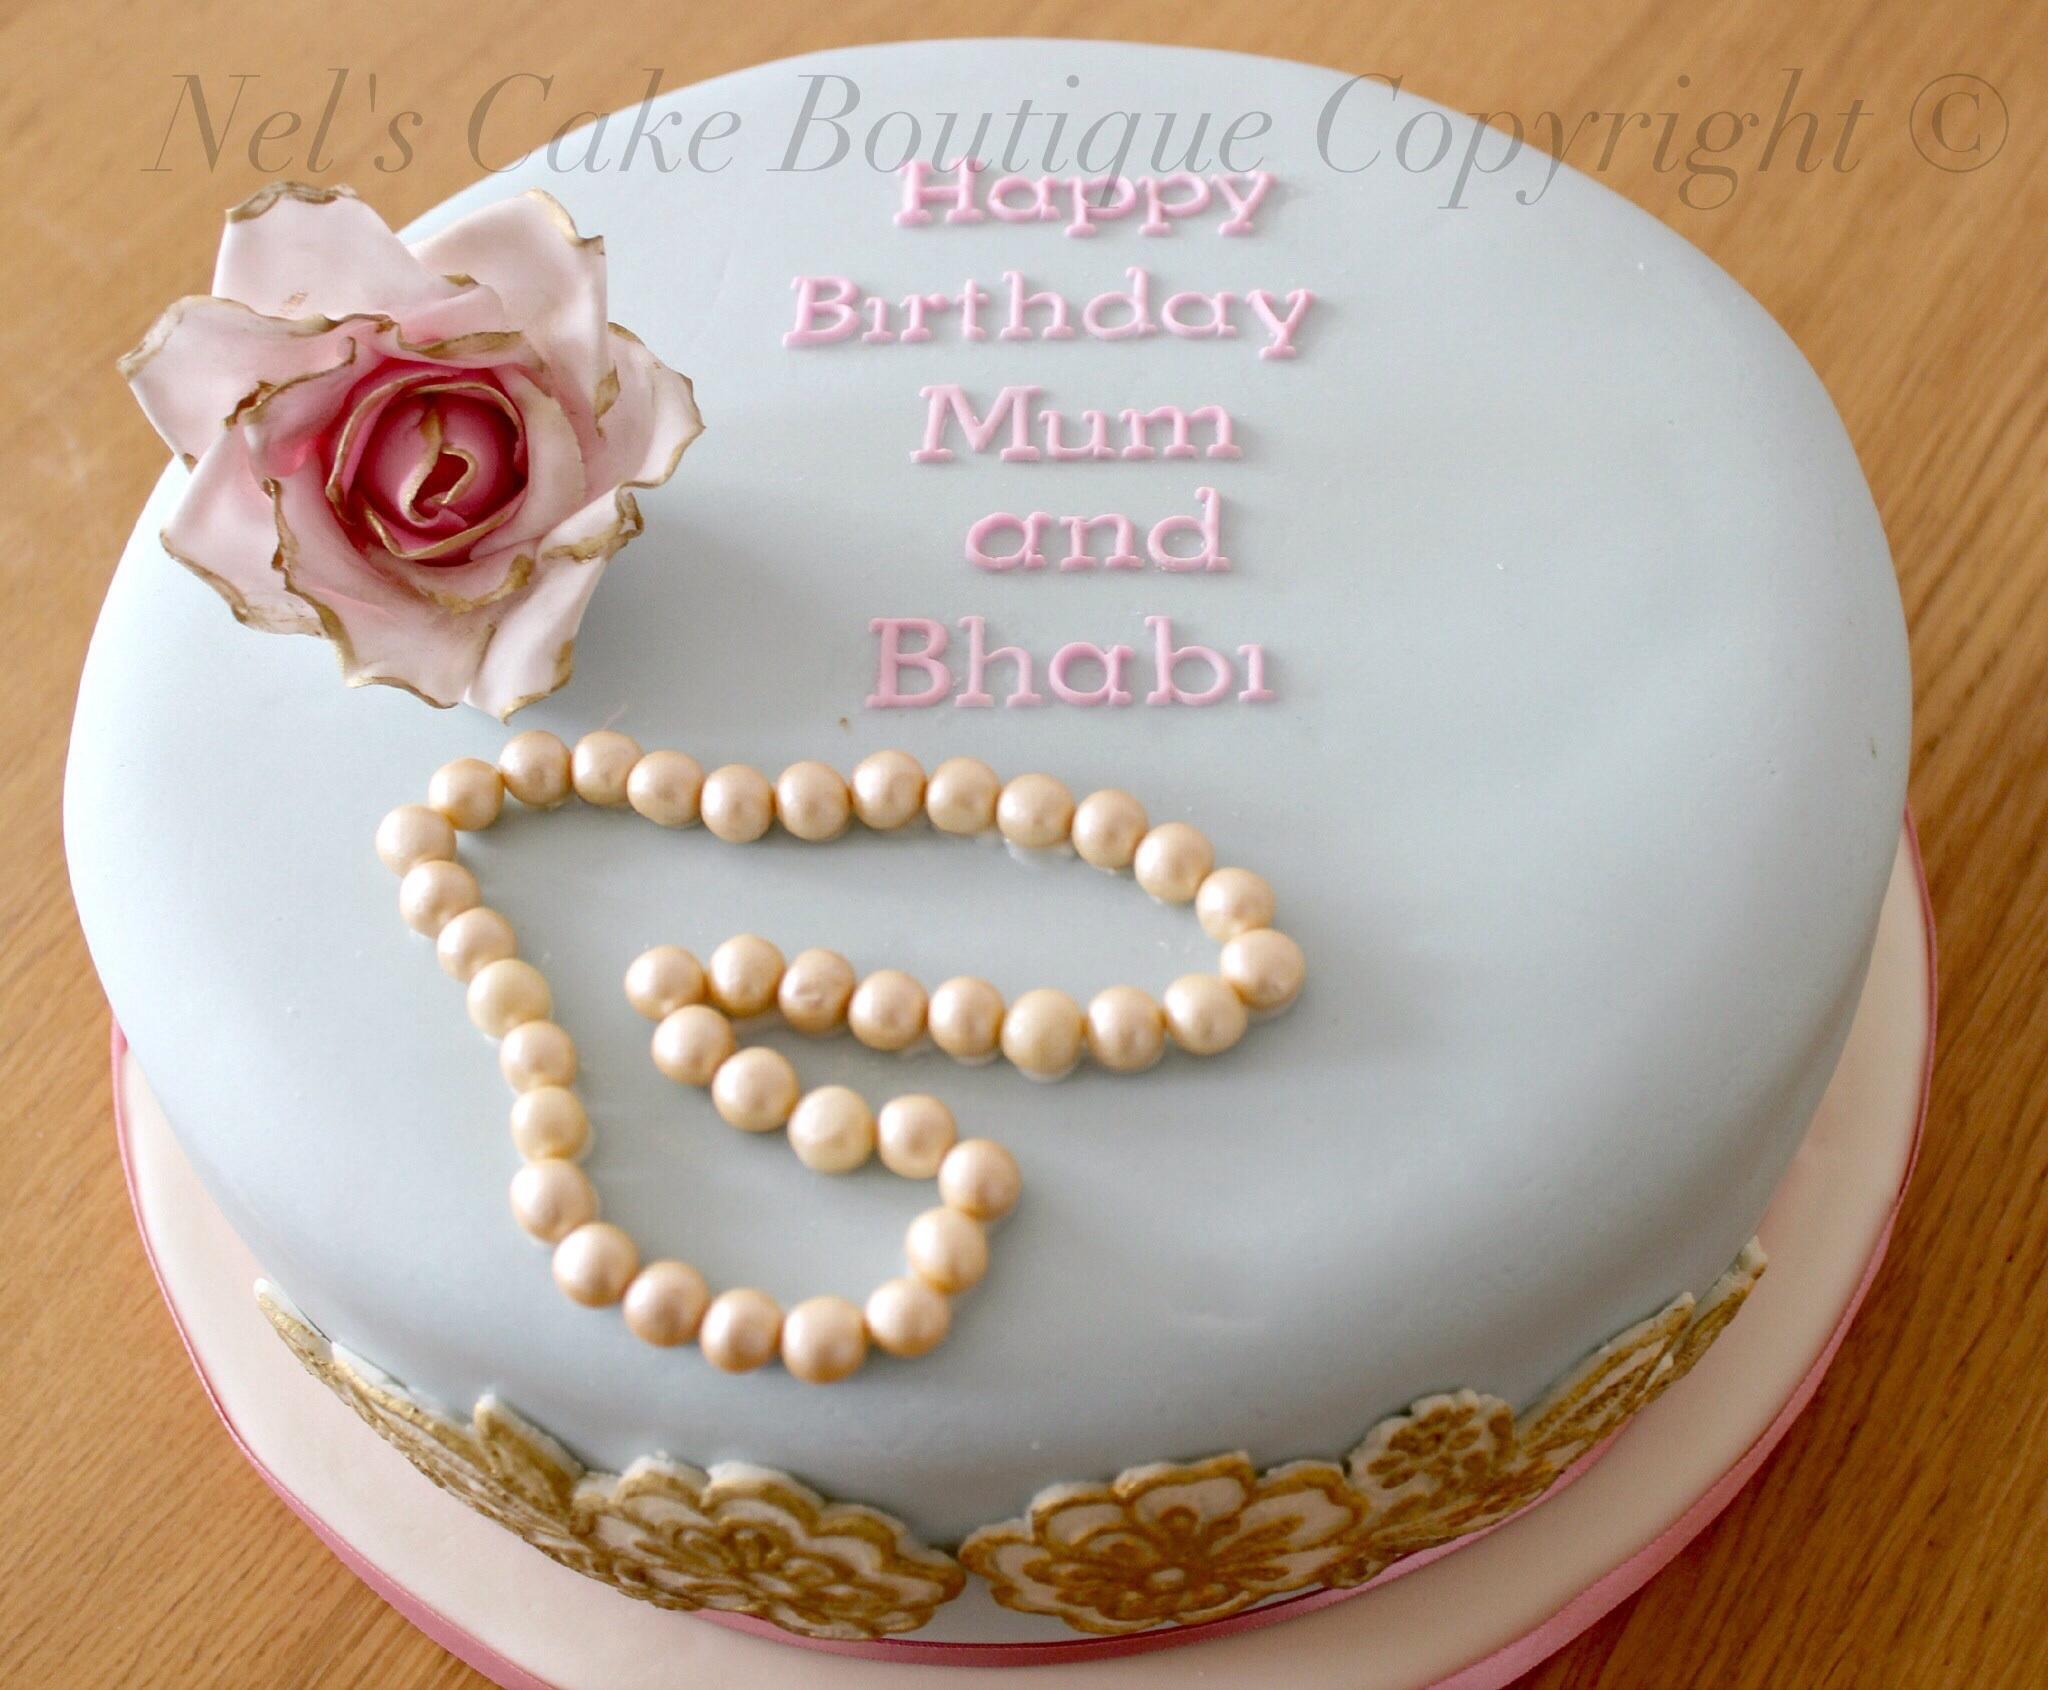 Vintage Shabby Chic Birthday Cake Cakecentral